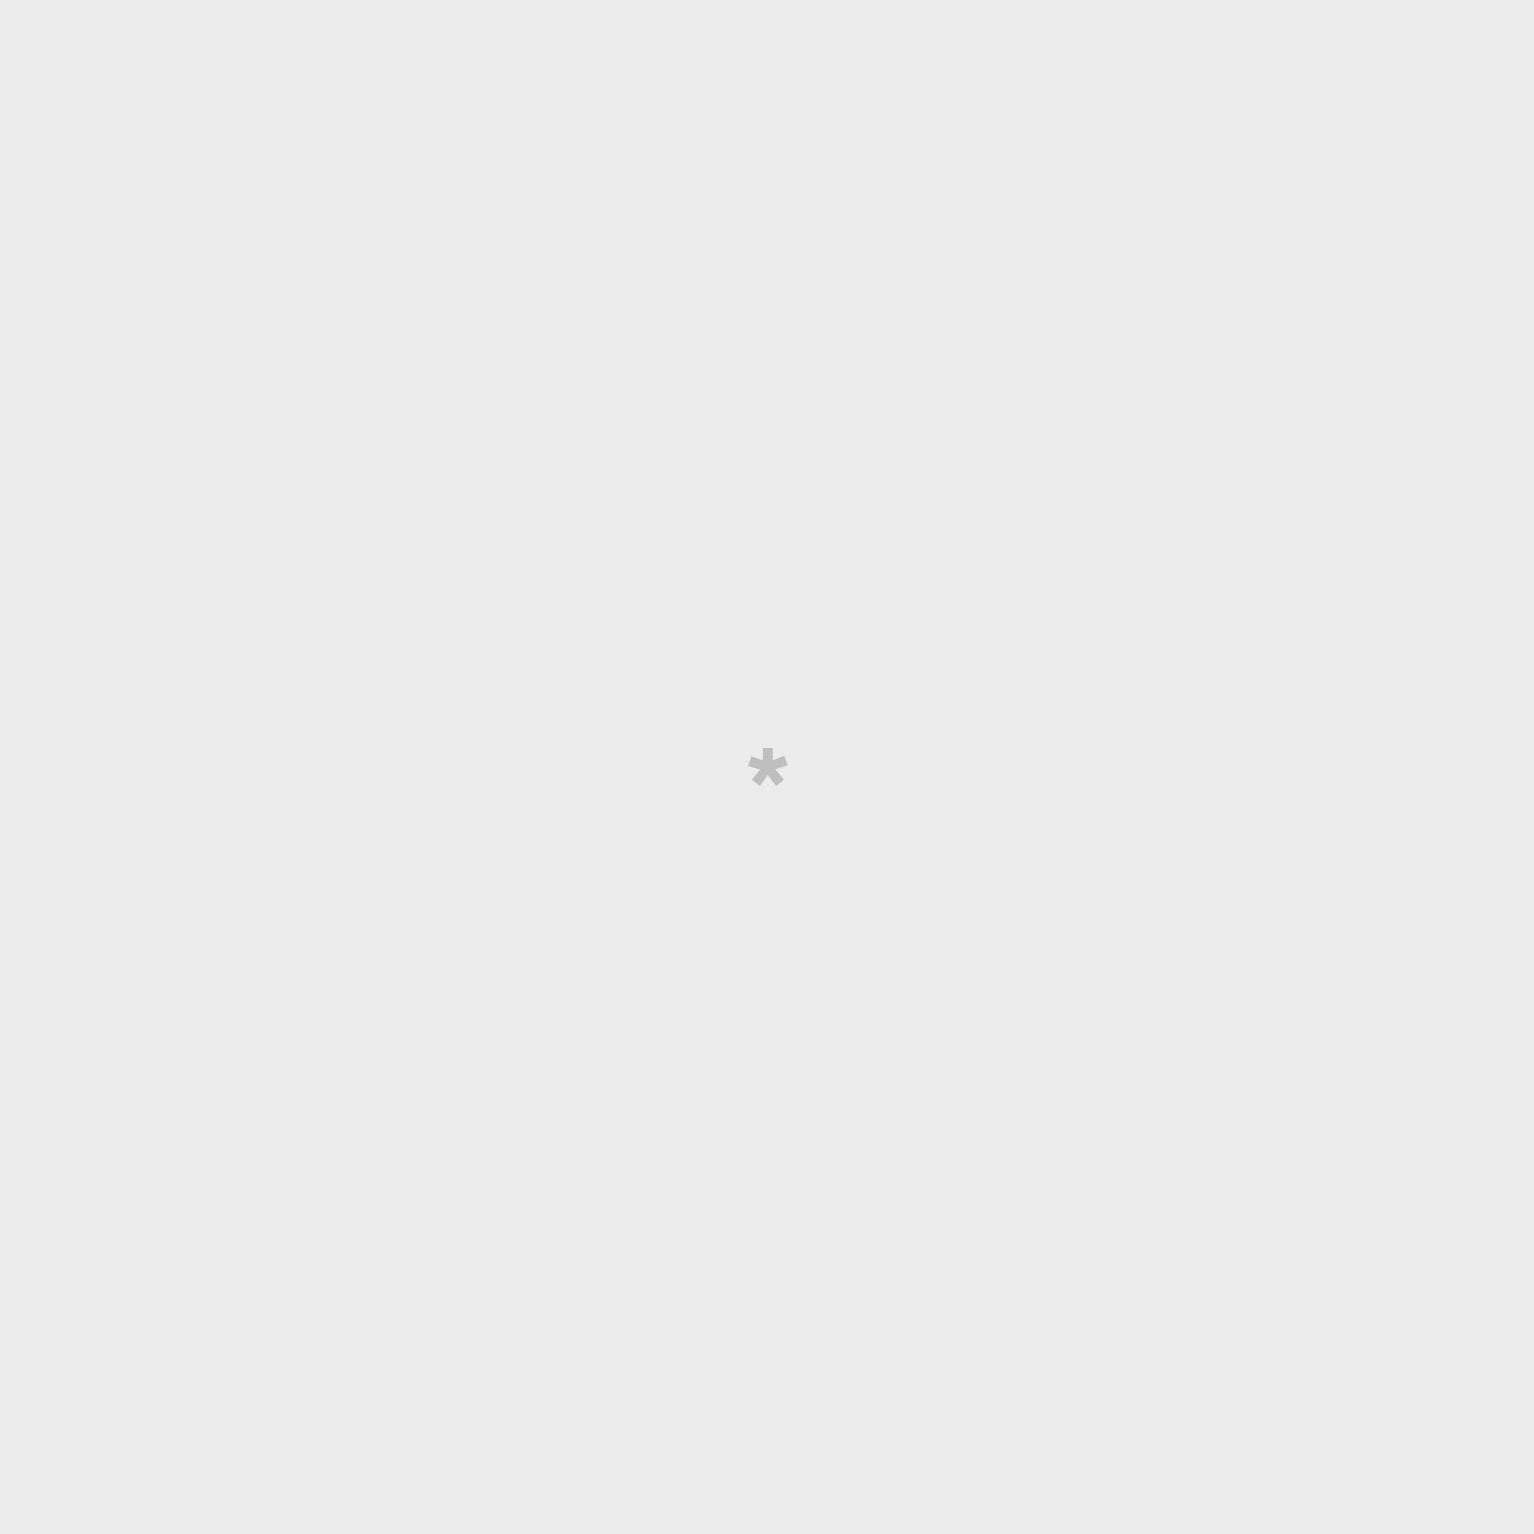 Apron - I'm the secret ingredient